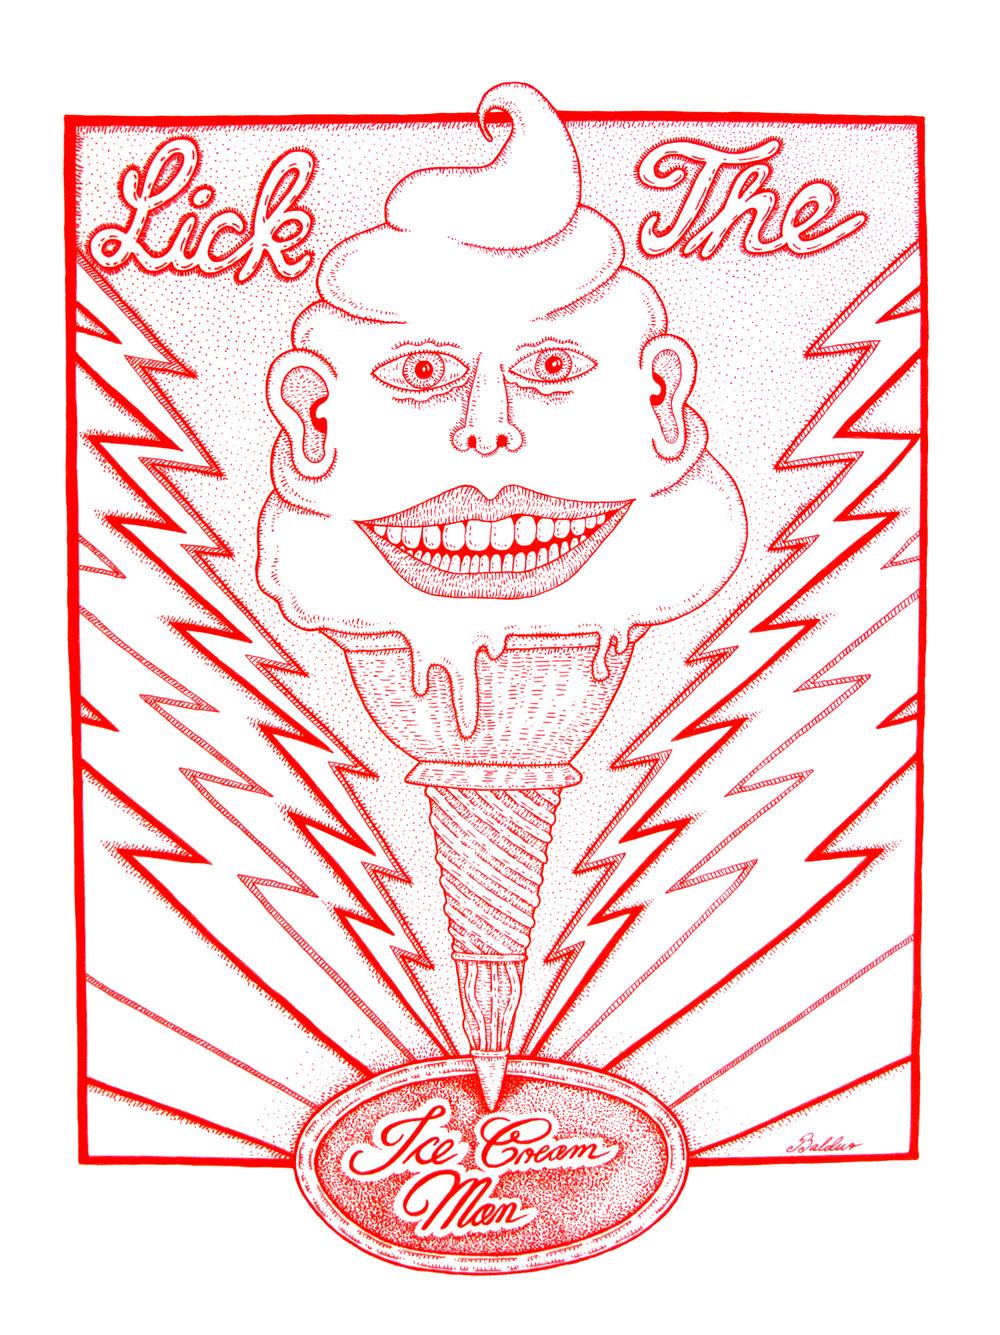 LICK THE ICE CREAM MAN